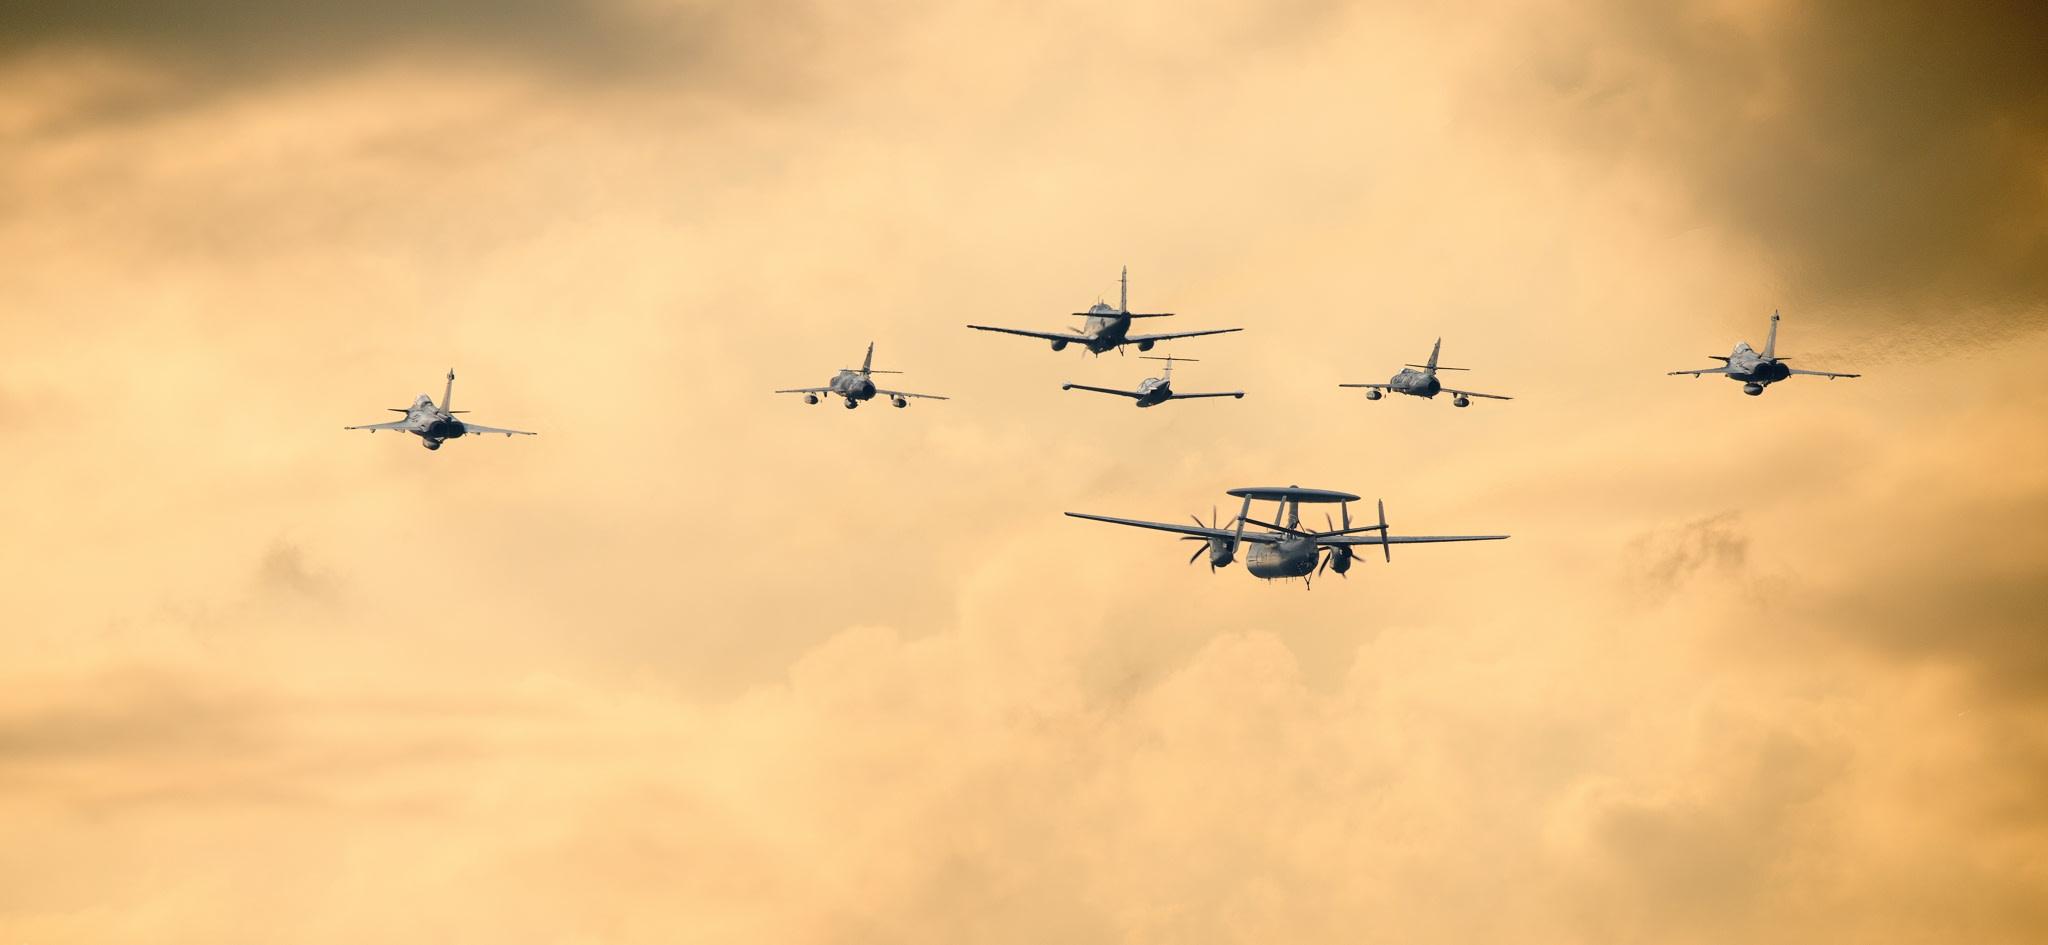 Photographie avion escadrillezz